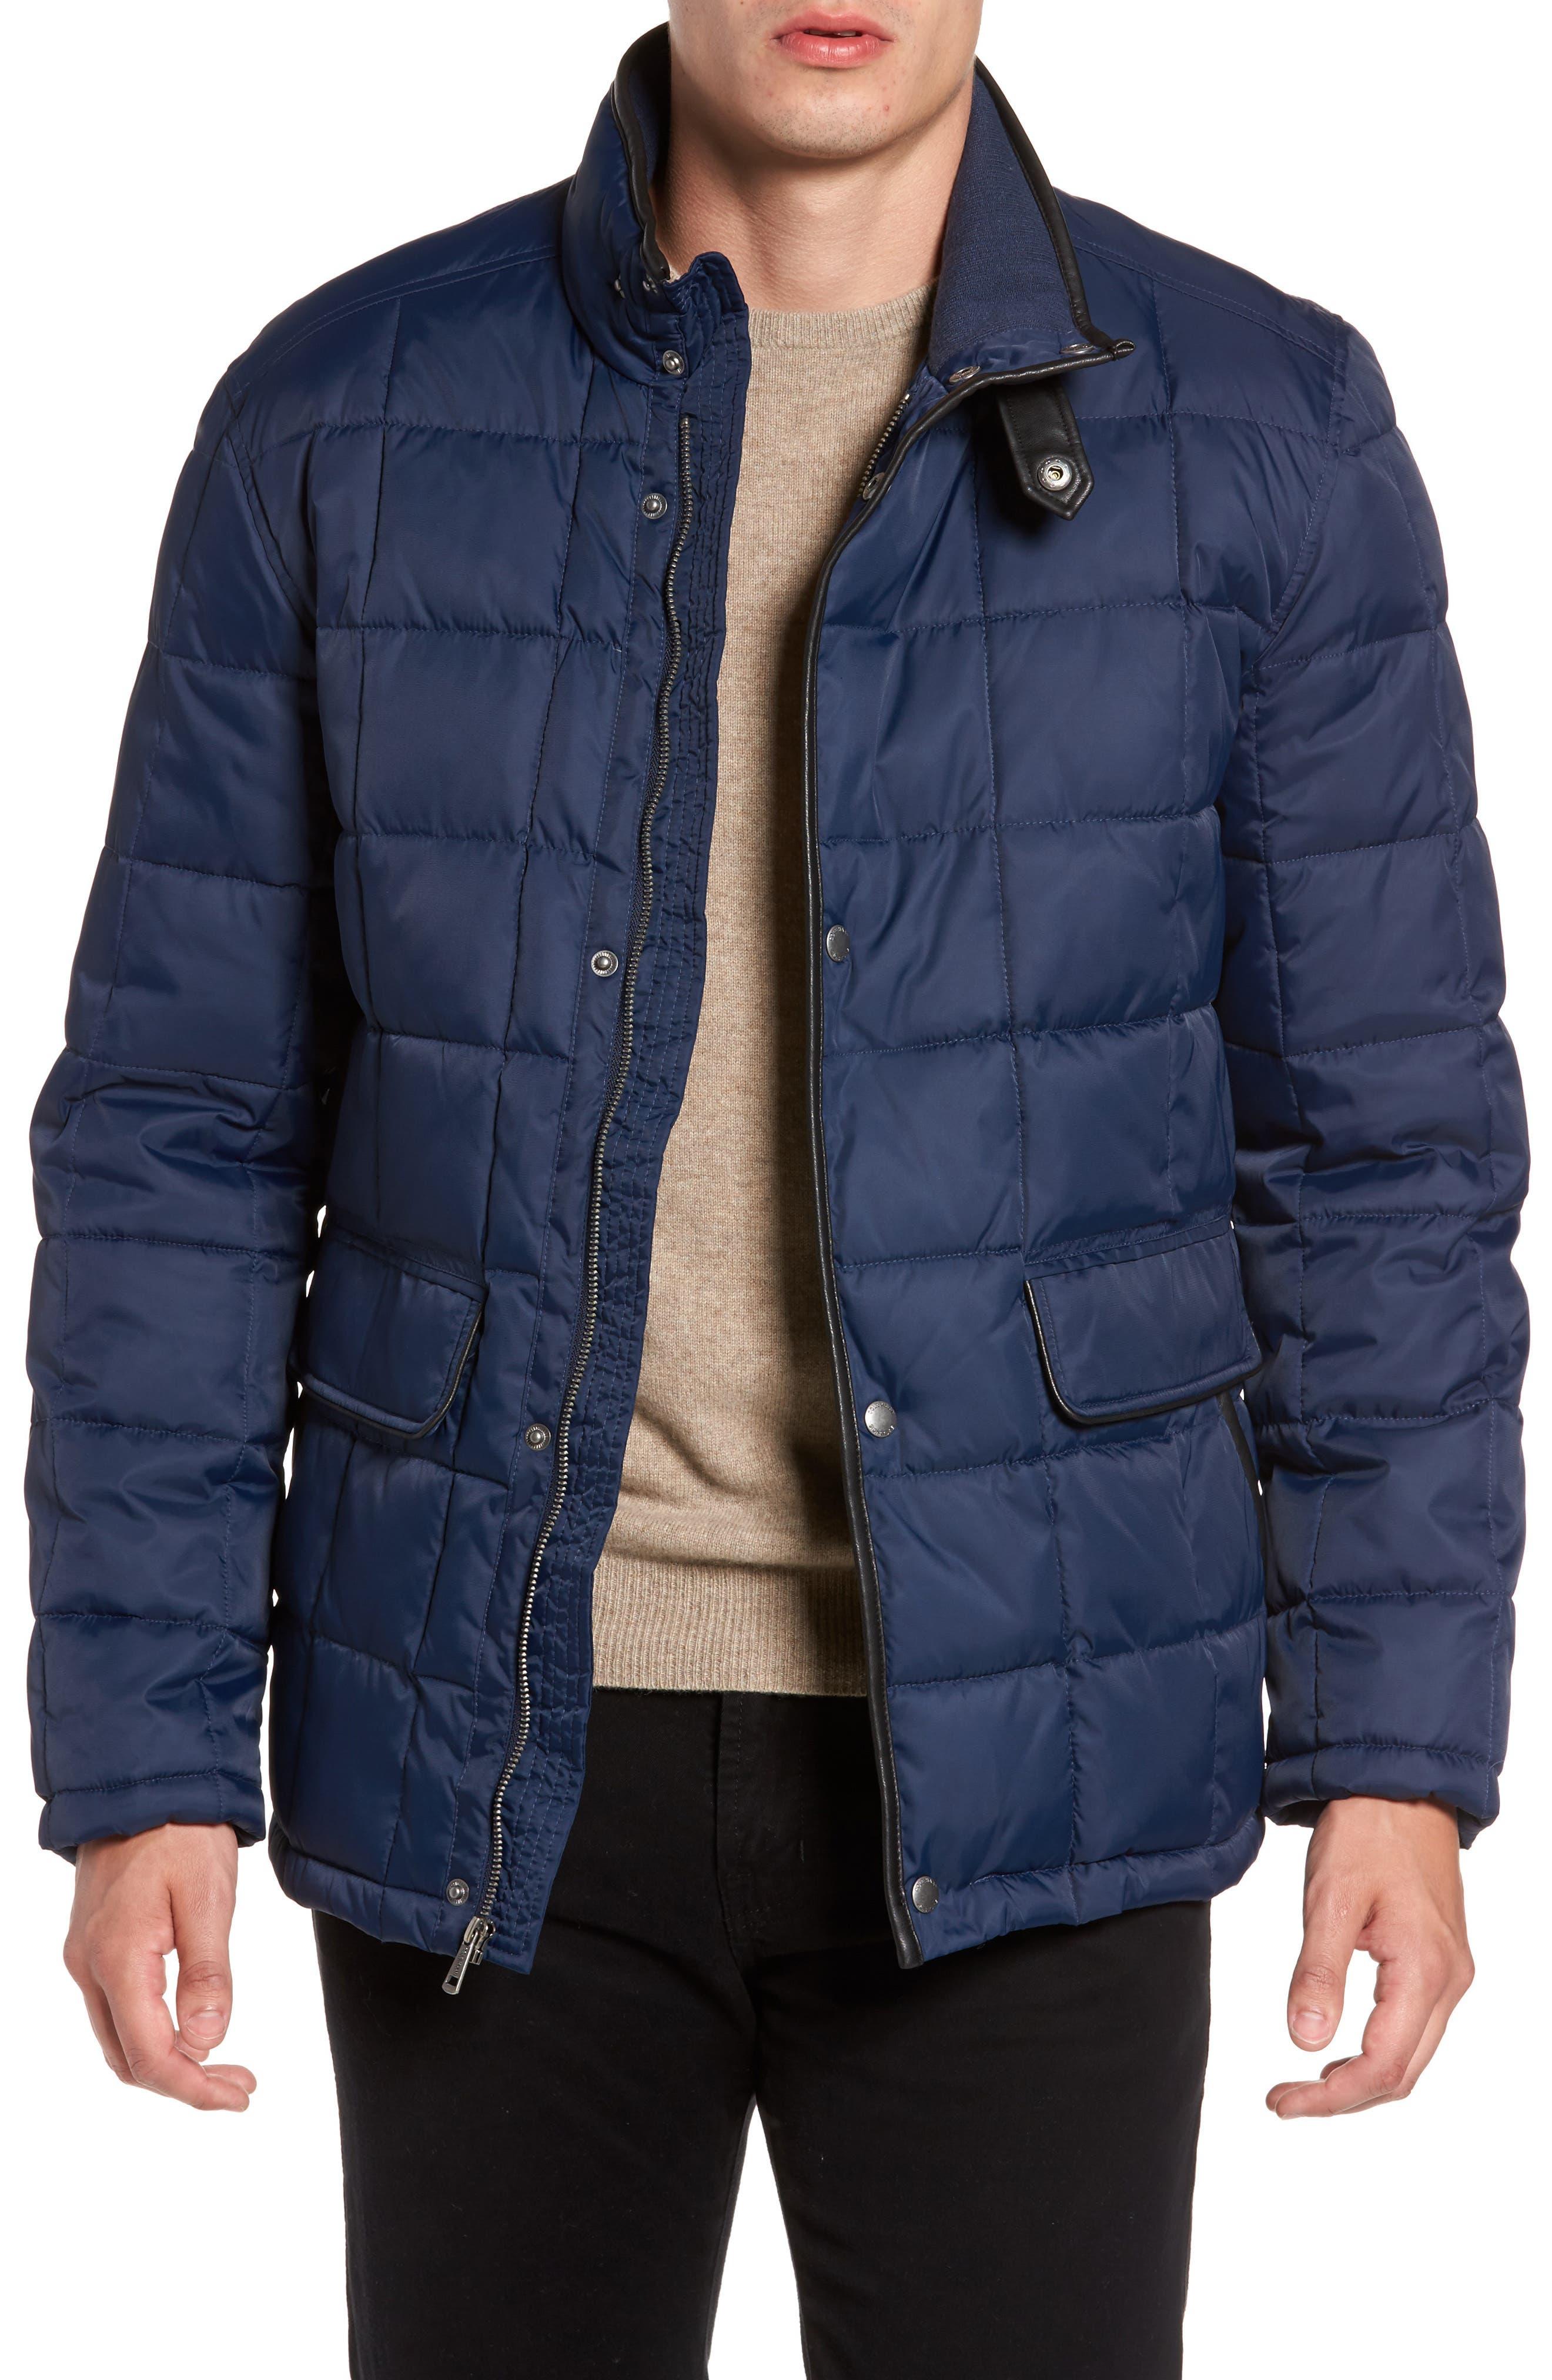 Box Quilted Jacket,                             Main thumbnail 1, color,                             NAVY